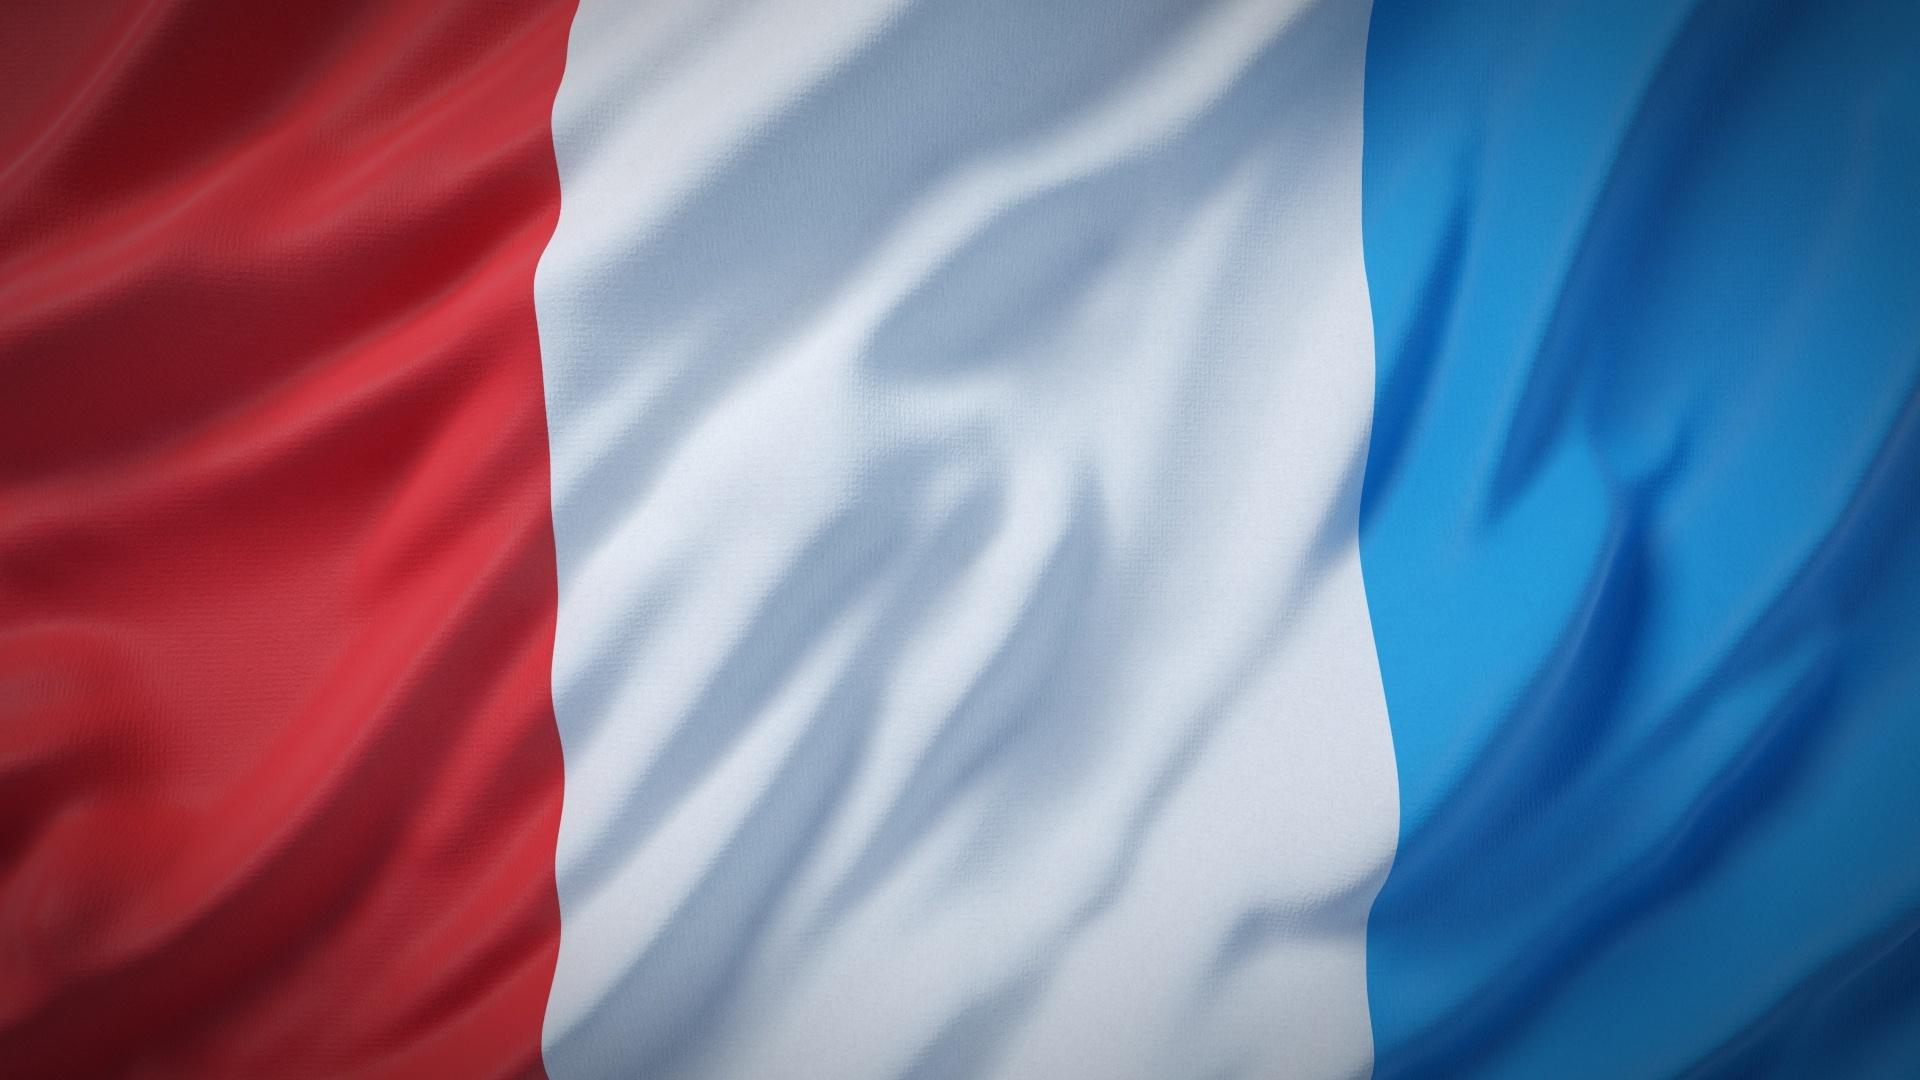 Французские регуляторы оштрафовали Google на 500,000,000 евро